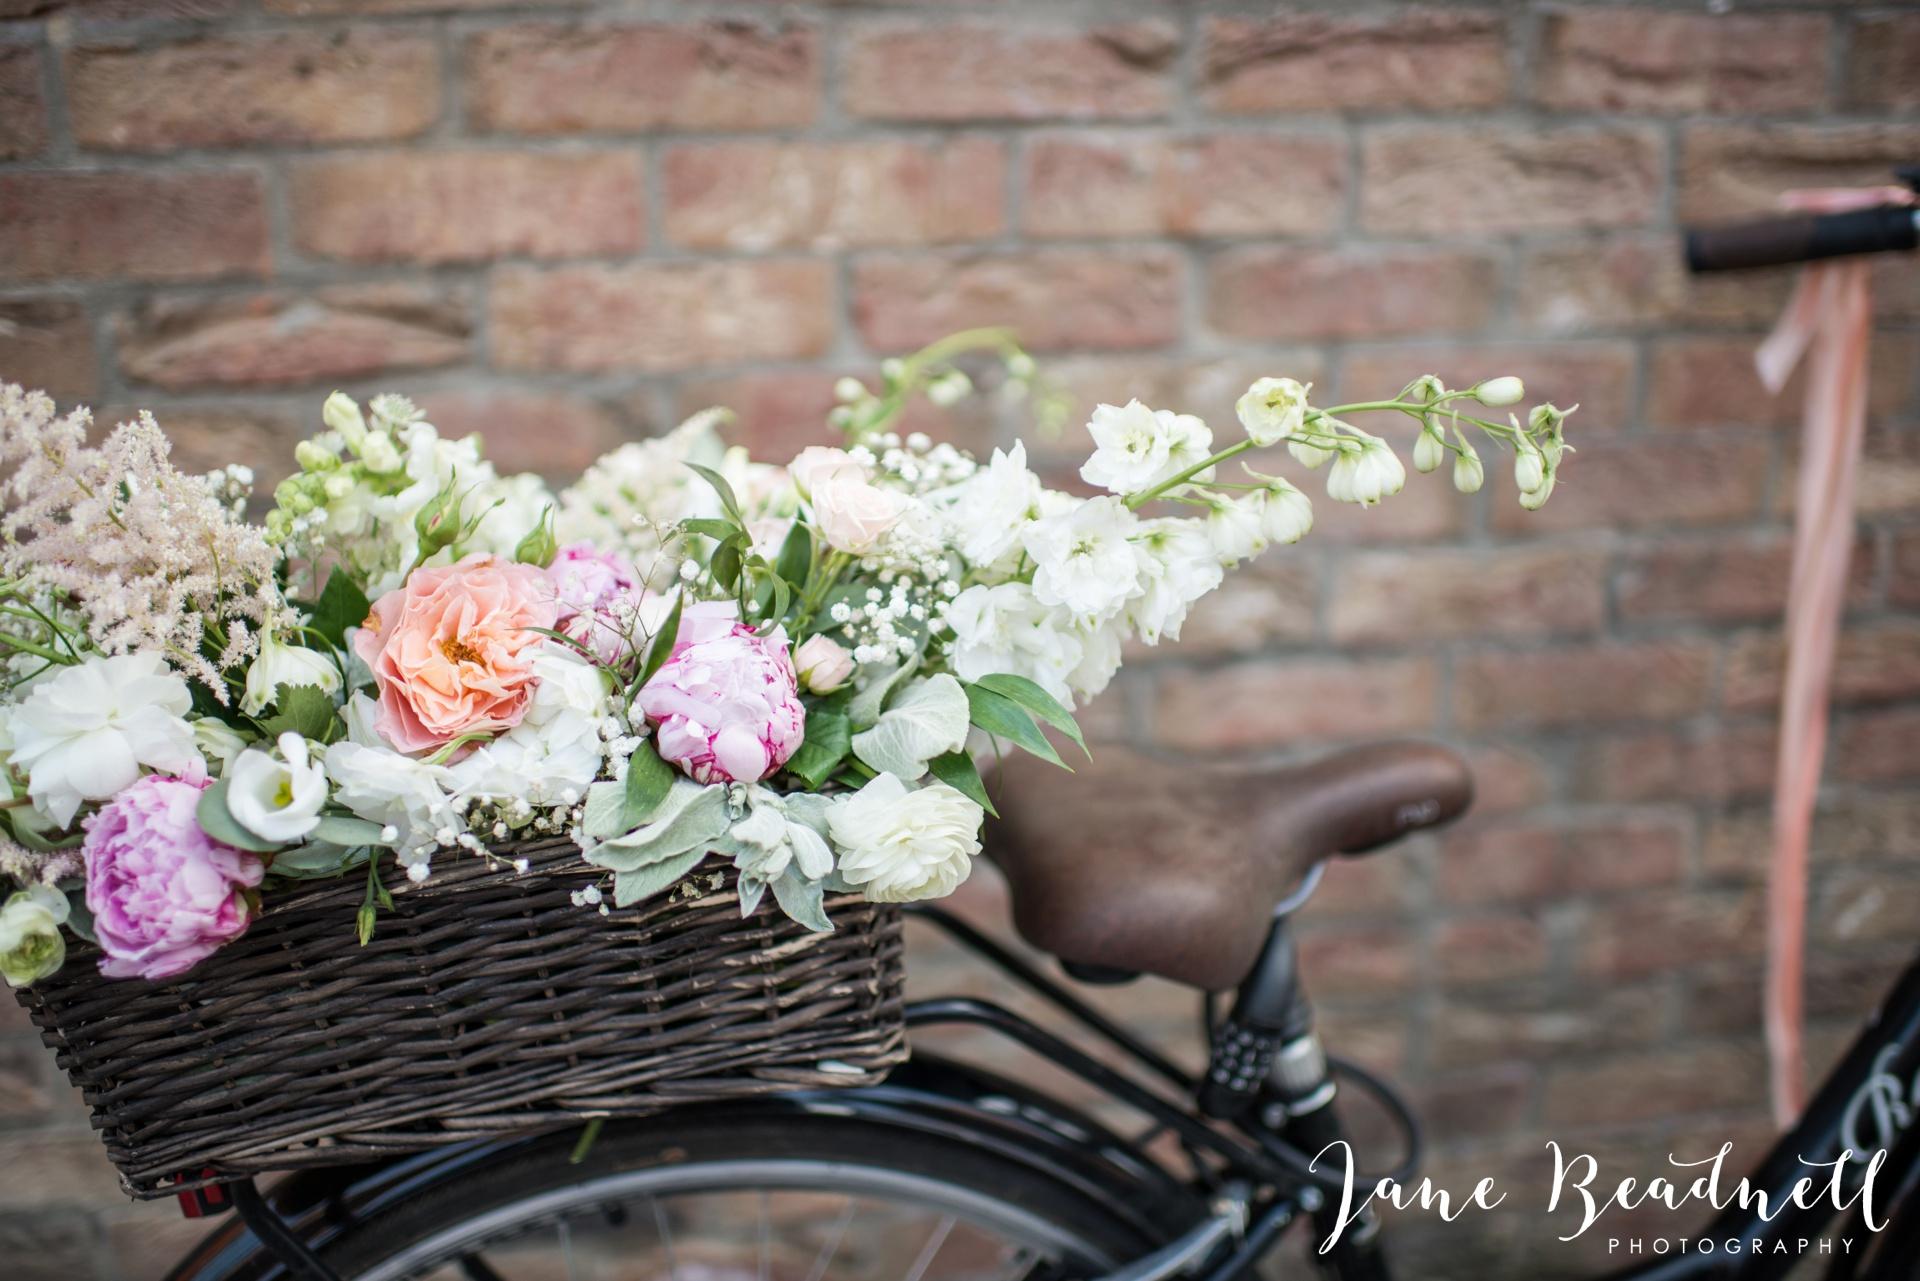 Jane Beadnell fine art wedding photographer York Bridal Photo Shoot_0013